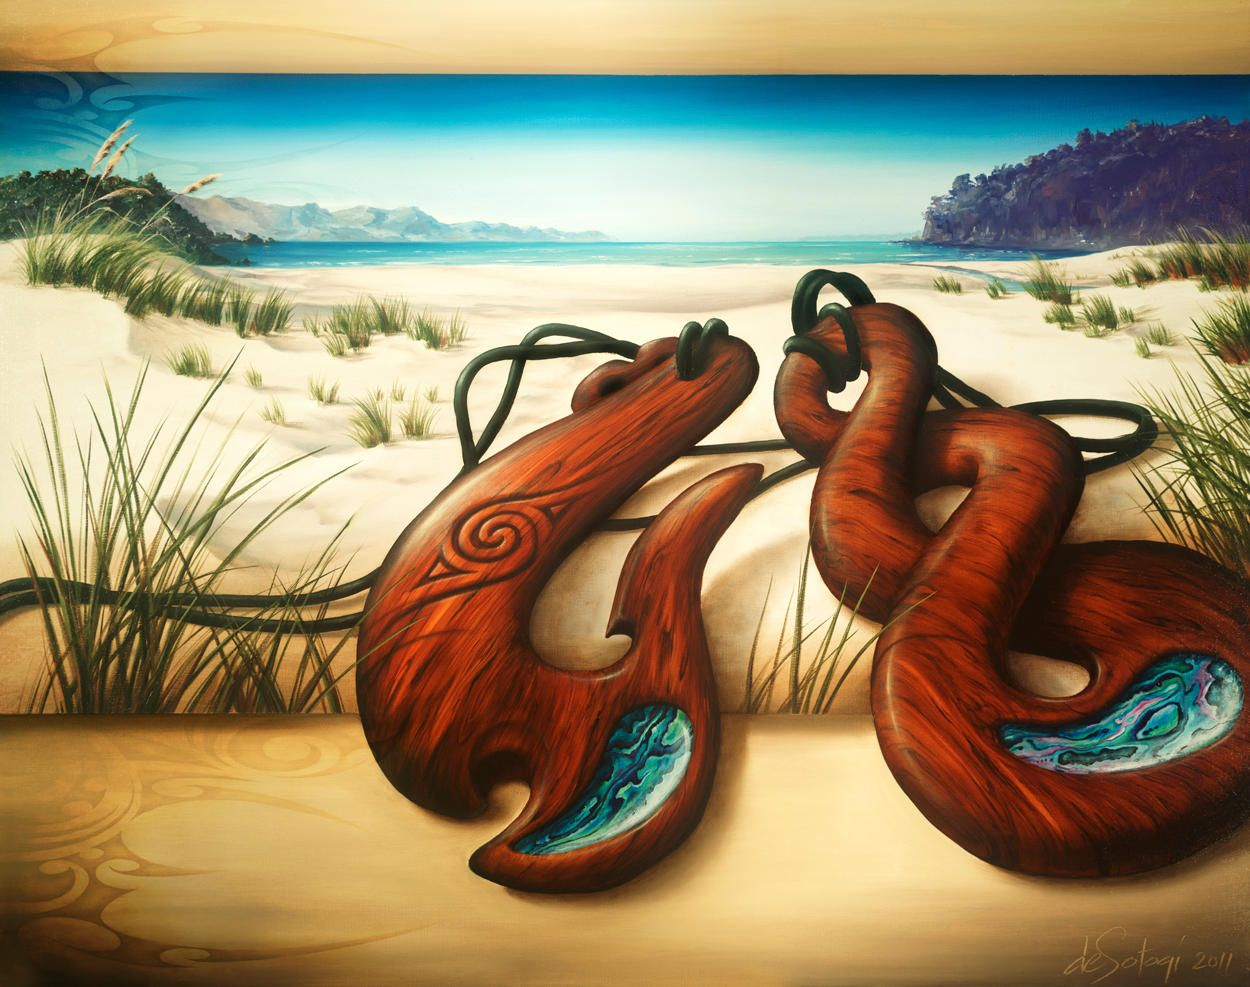 The hip-hop rappingirls tyme : Photo | Maori art, Art